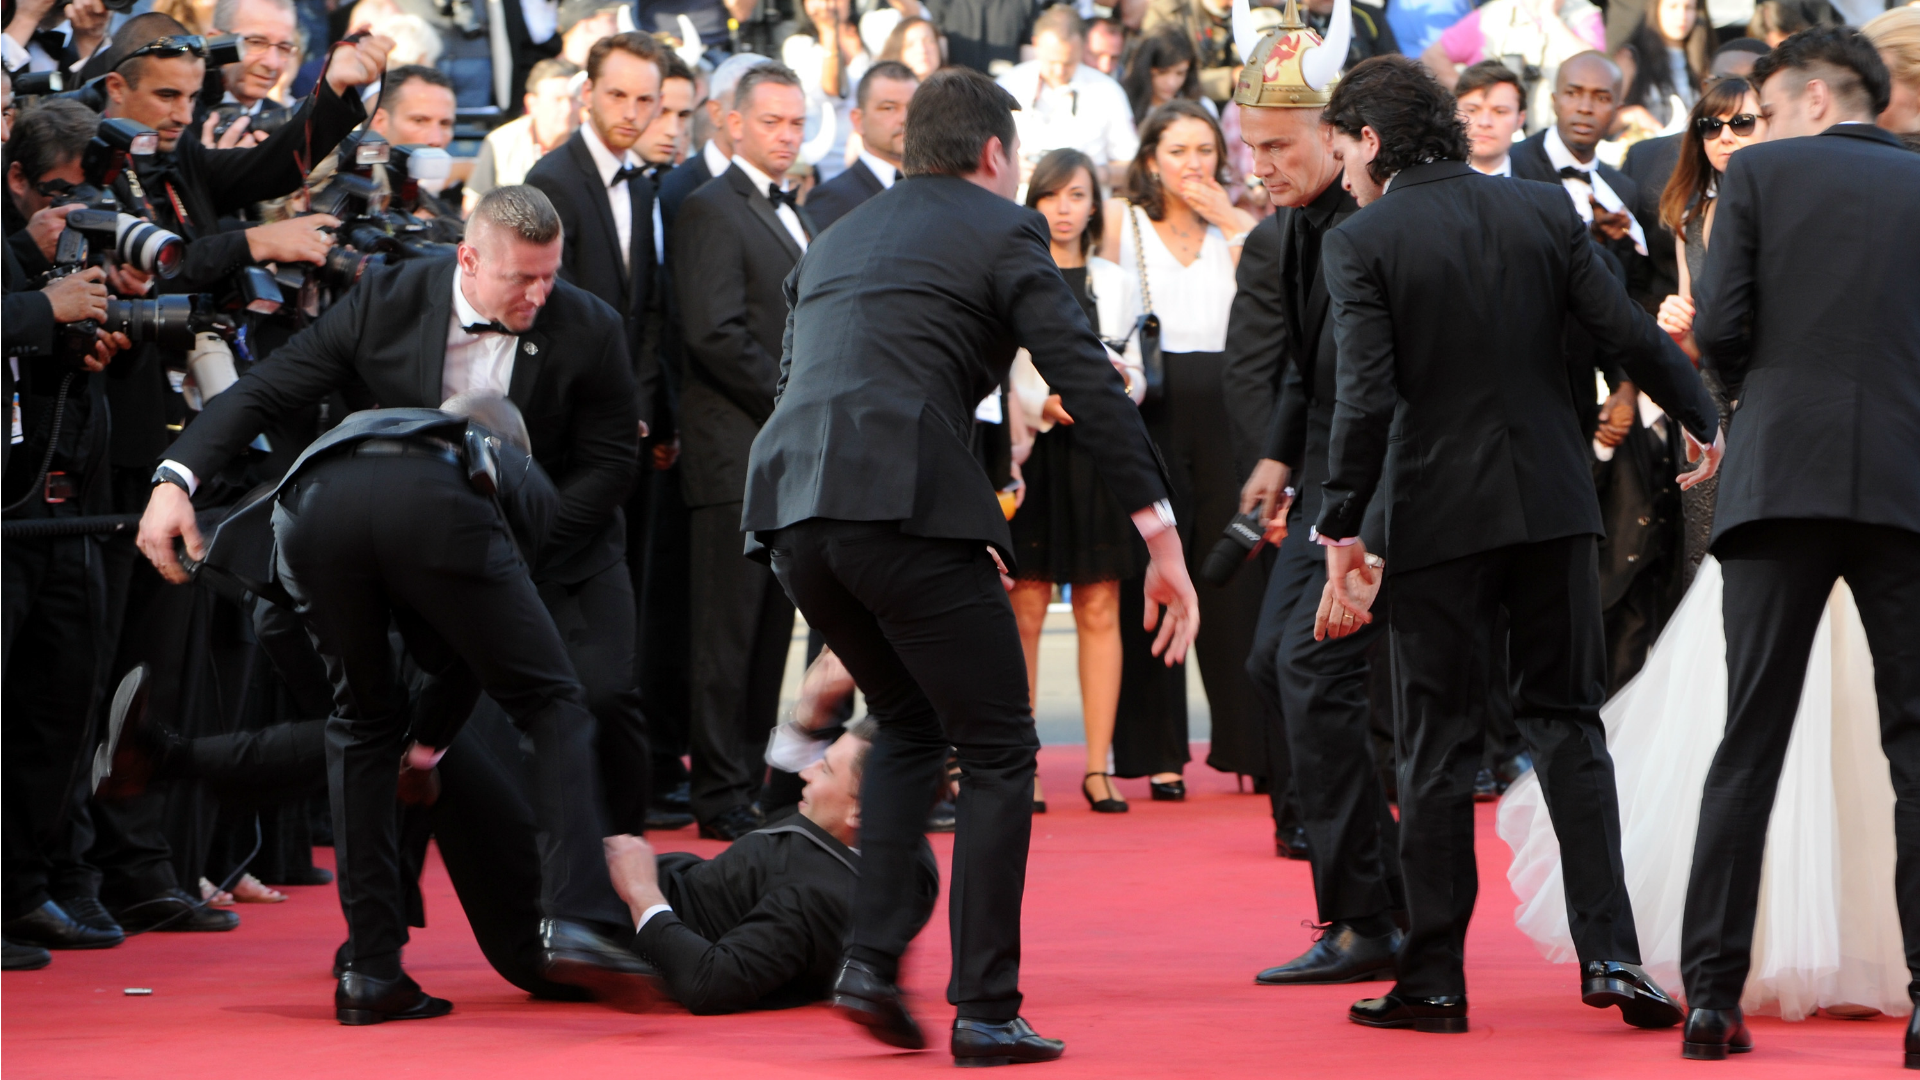 CannesFilmFestivalprankster